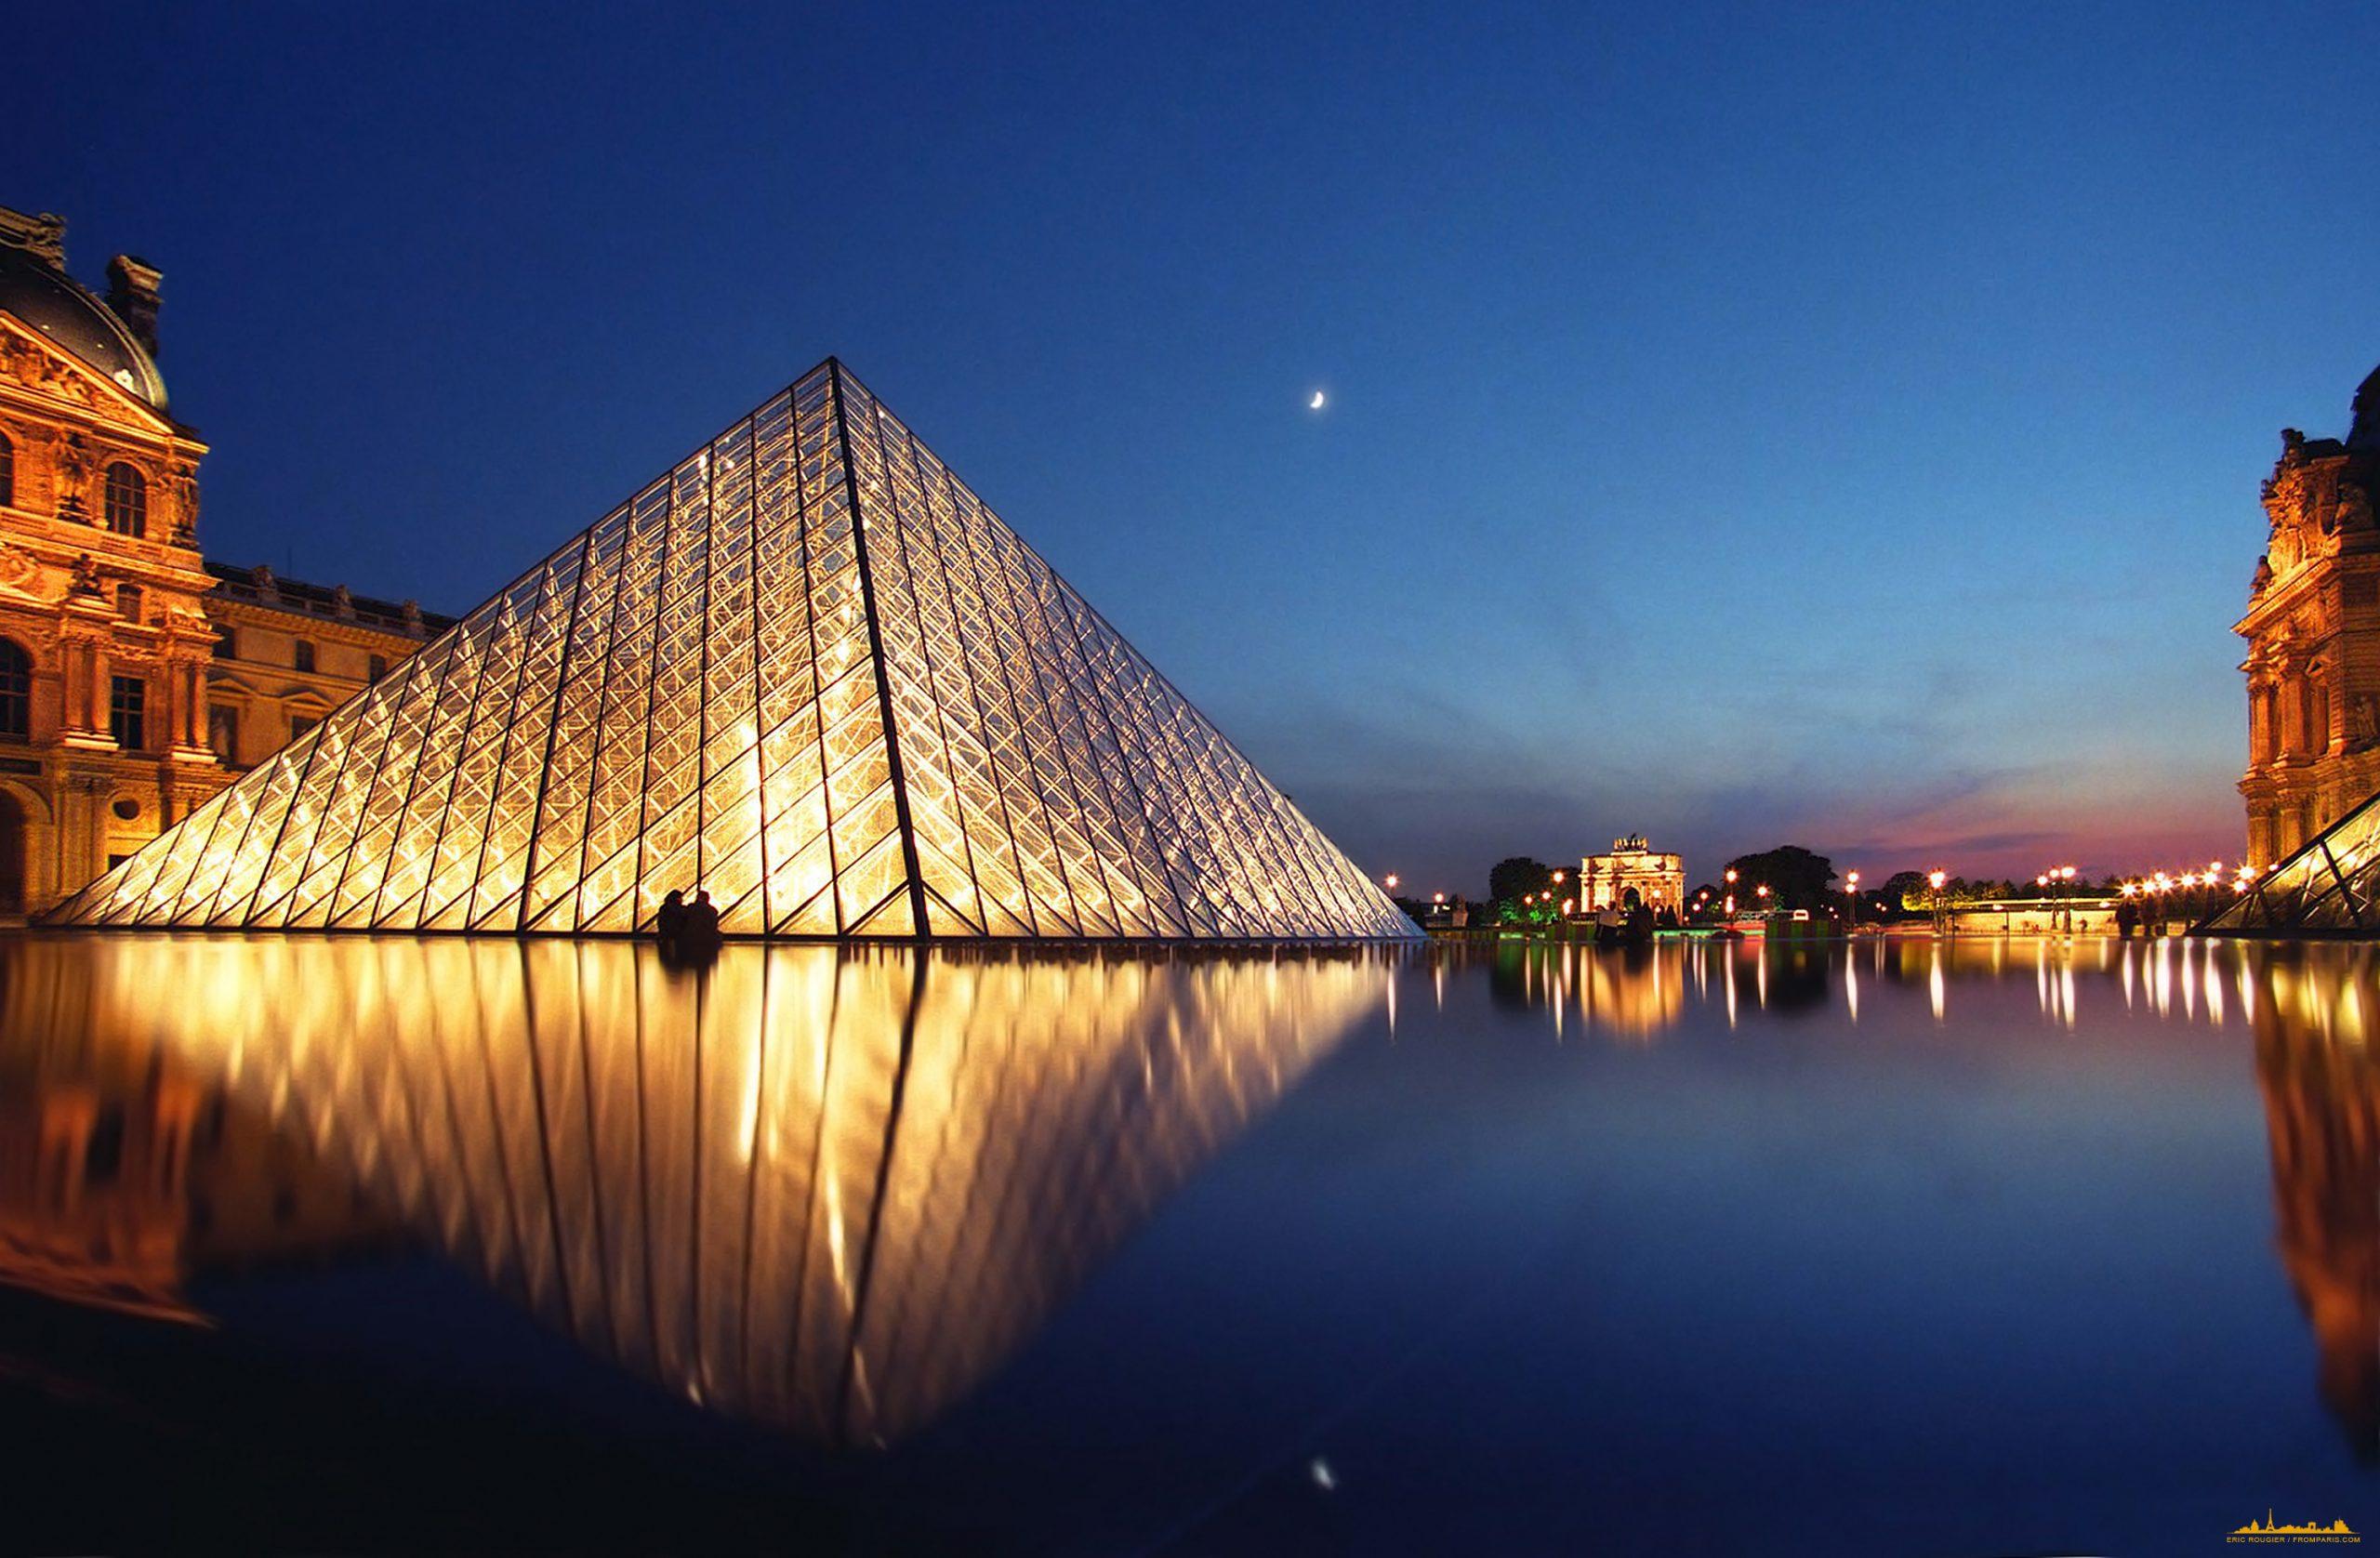 Музей Лувр открыл доступ к онлайн-экскурсии